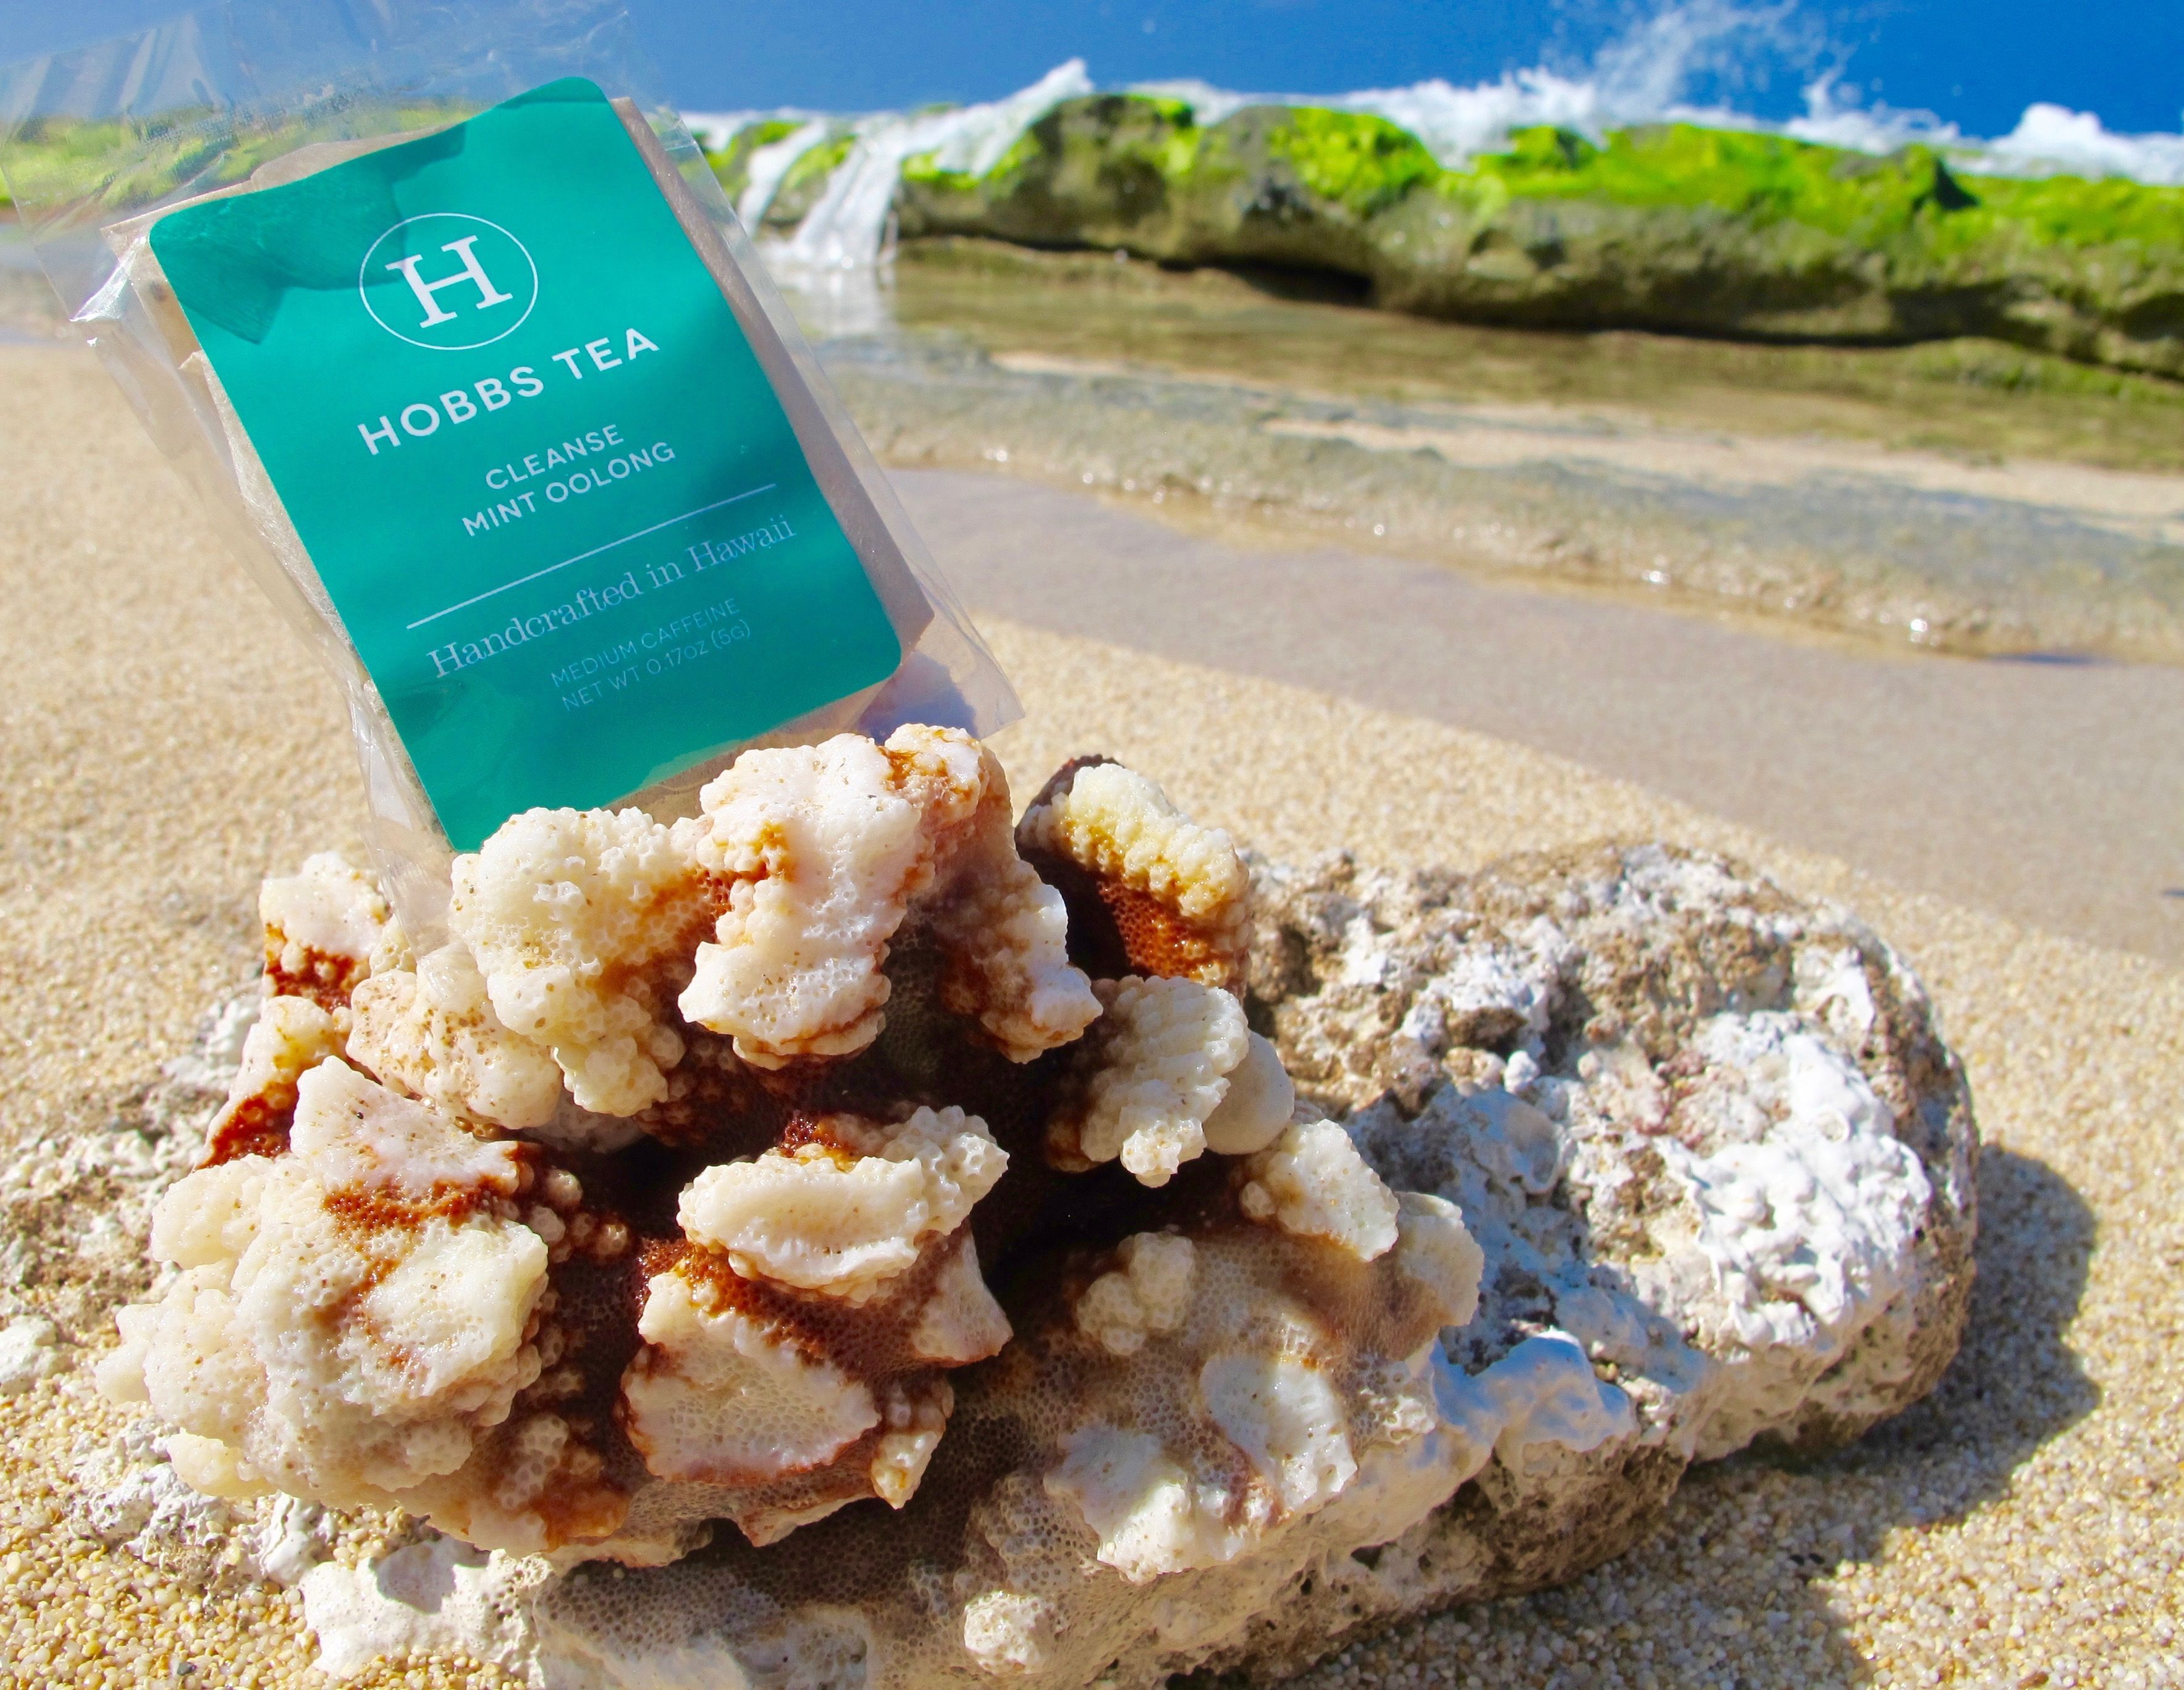 Coral fresh! #organic #health #cleanse #mint #oolong #hawaii #tea